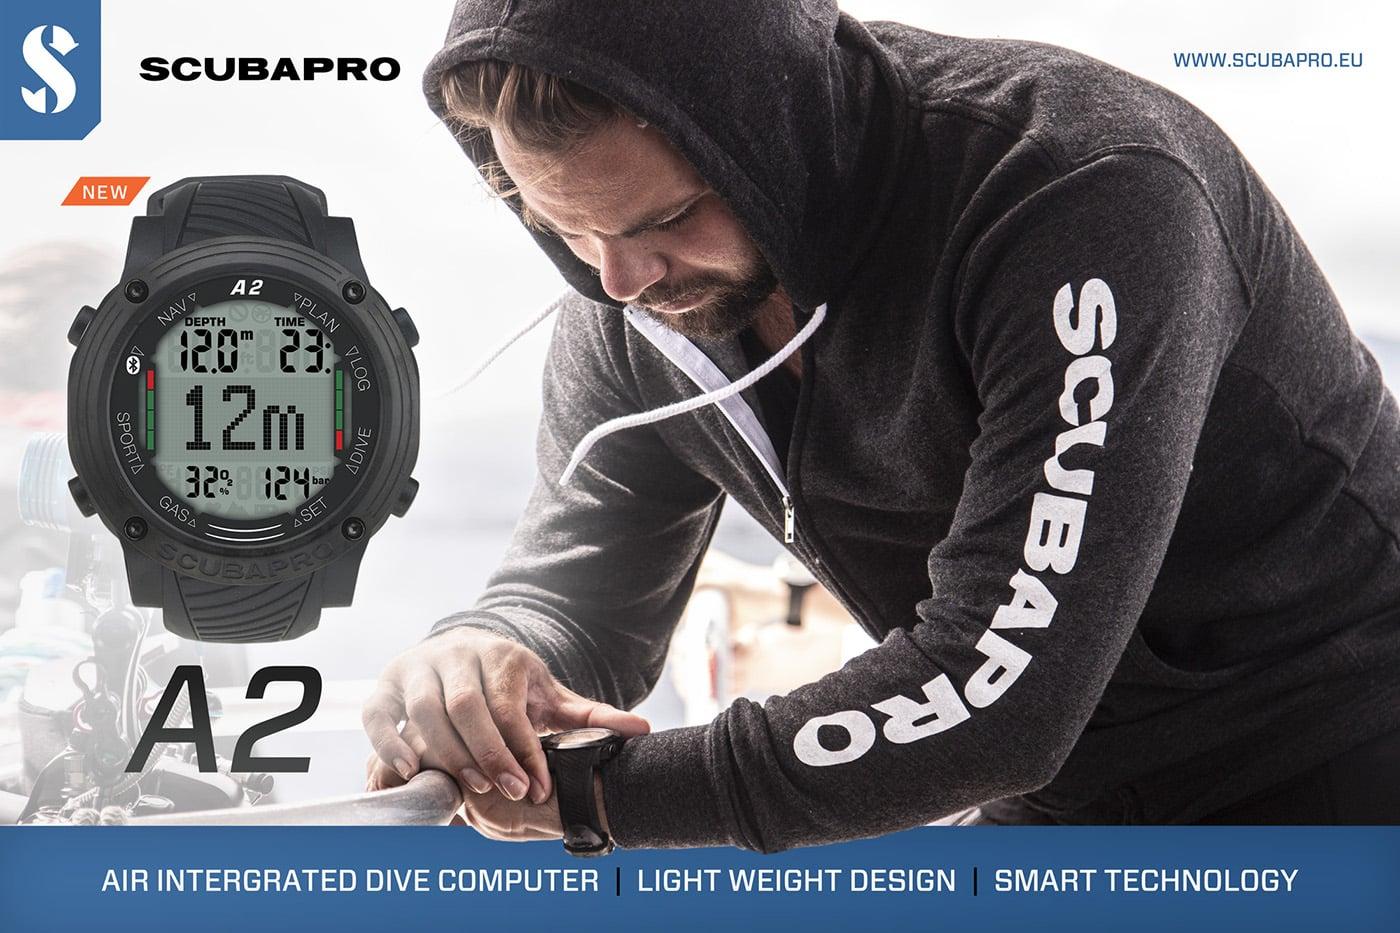 Scubapro Aladin A2 komputer nurkowy divers24.pl